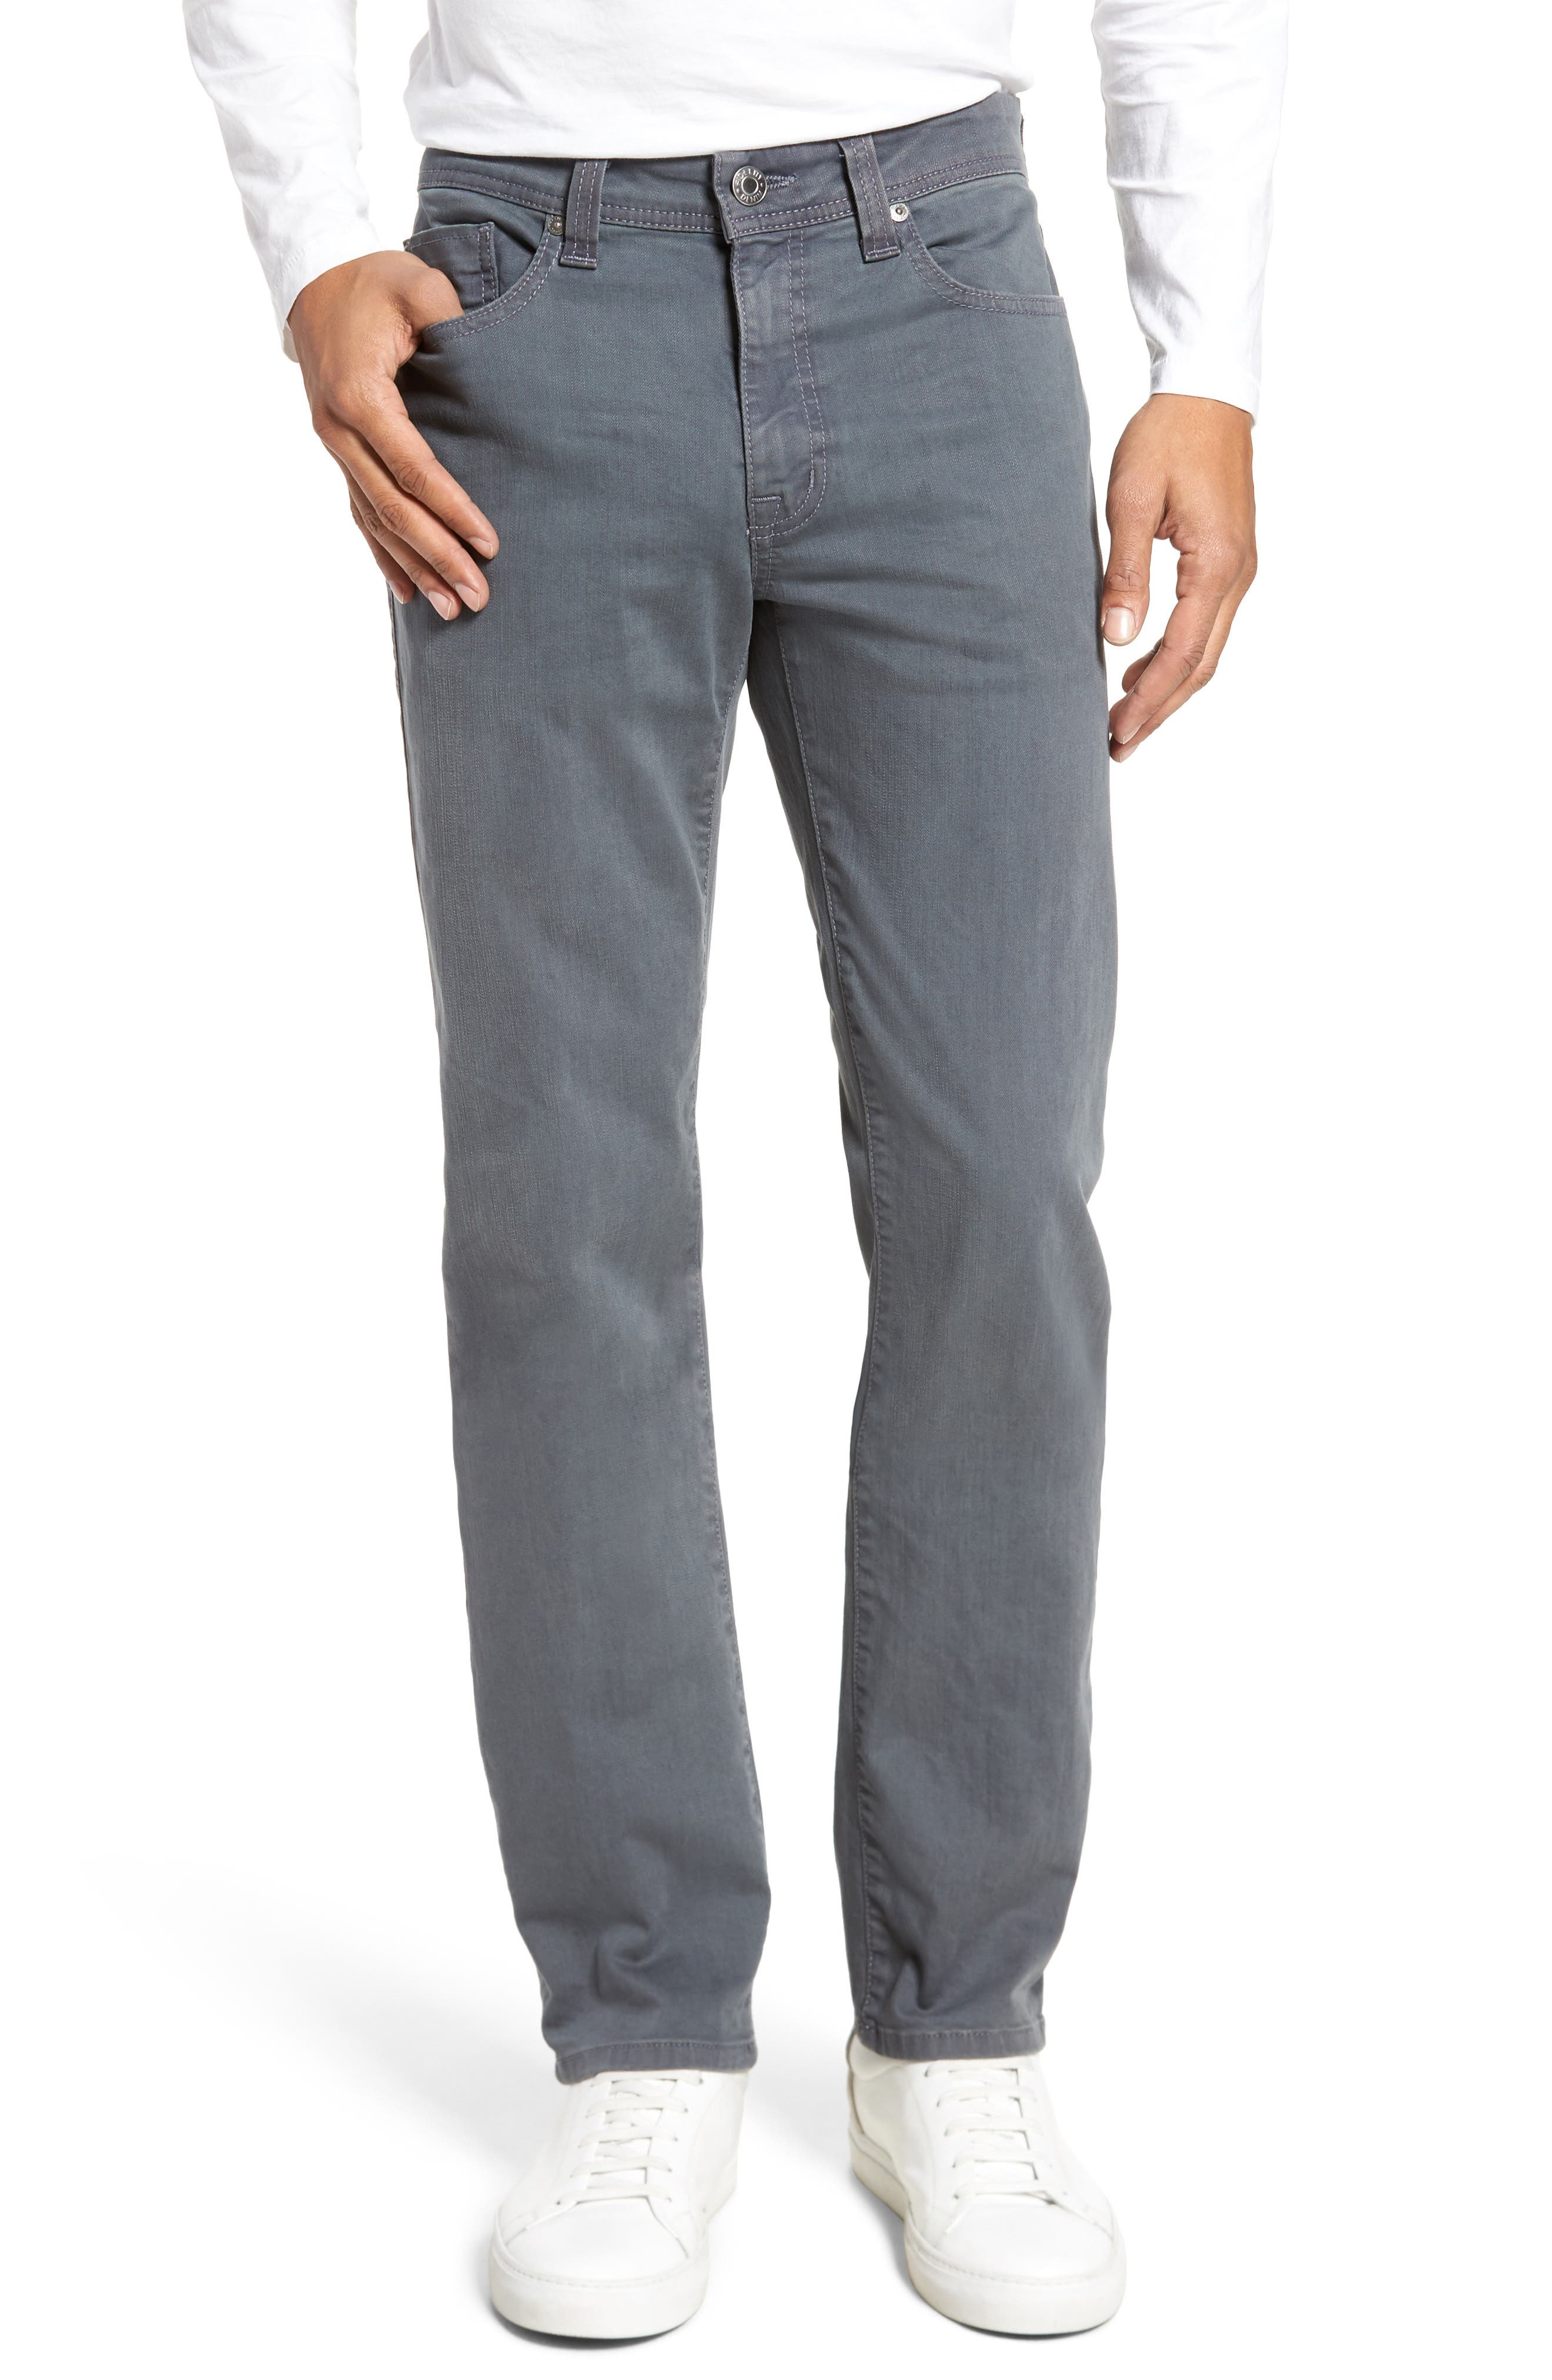 Main Image - Fidelity Denim Jimmy Slim Straight Fit Jeans (Oyster)